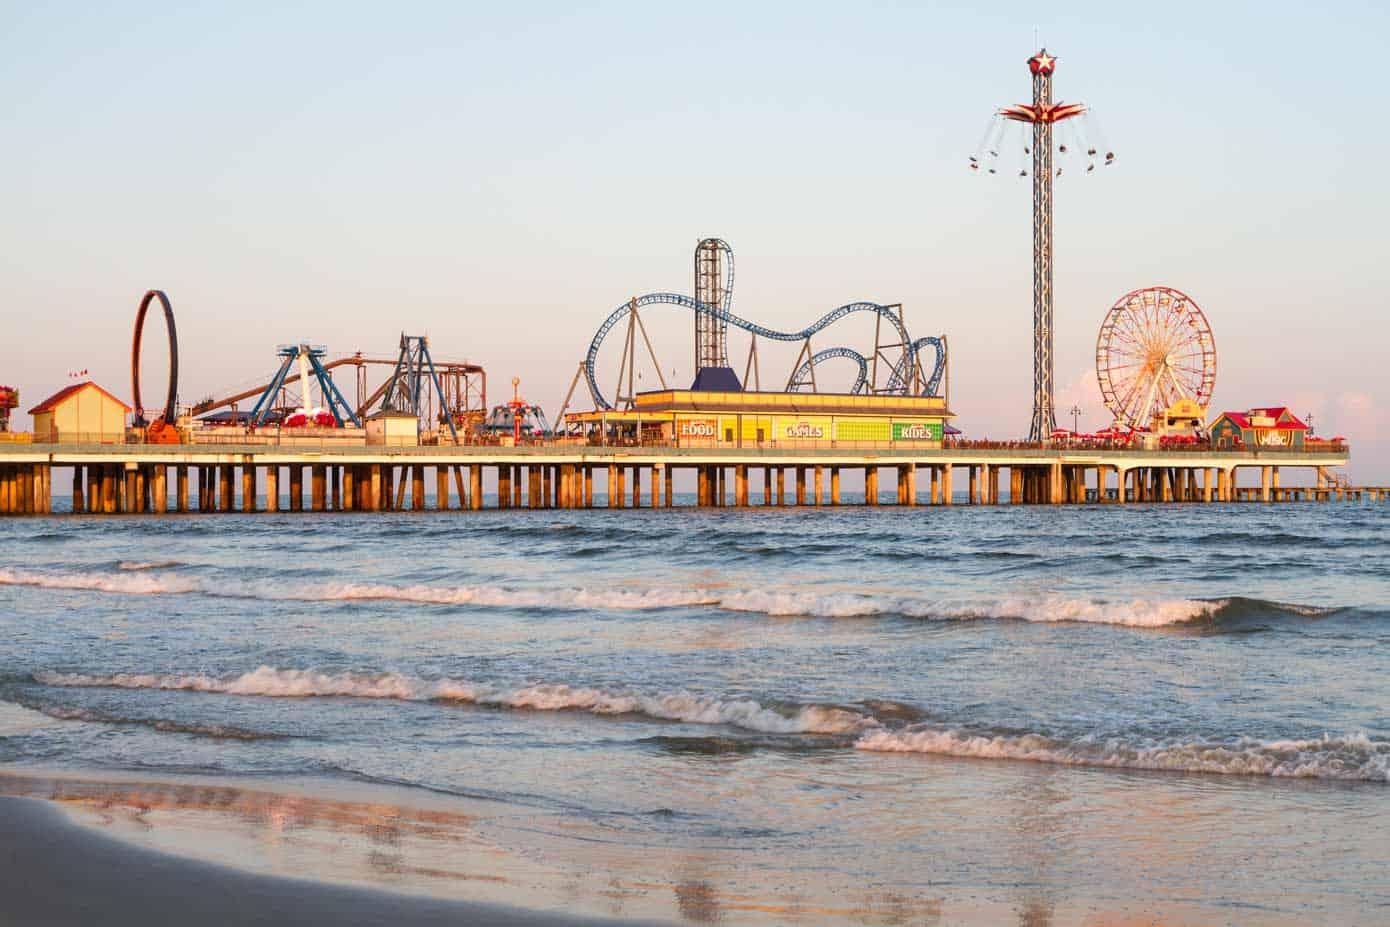 The historic Pleasure Pier Boardwalk in Galveston, Texas.